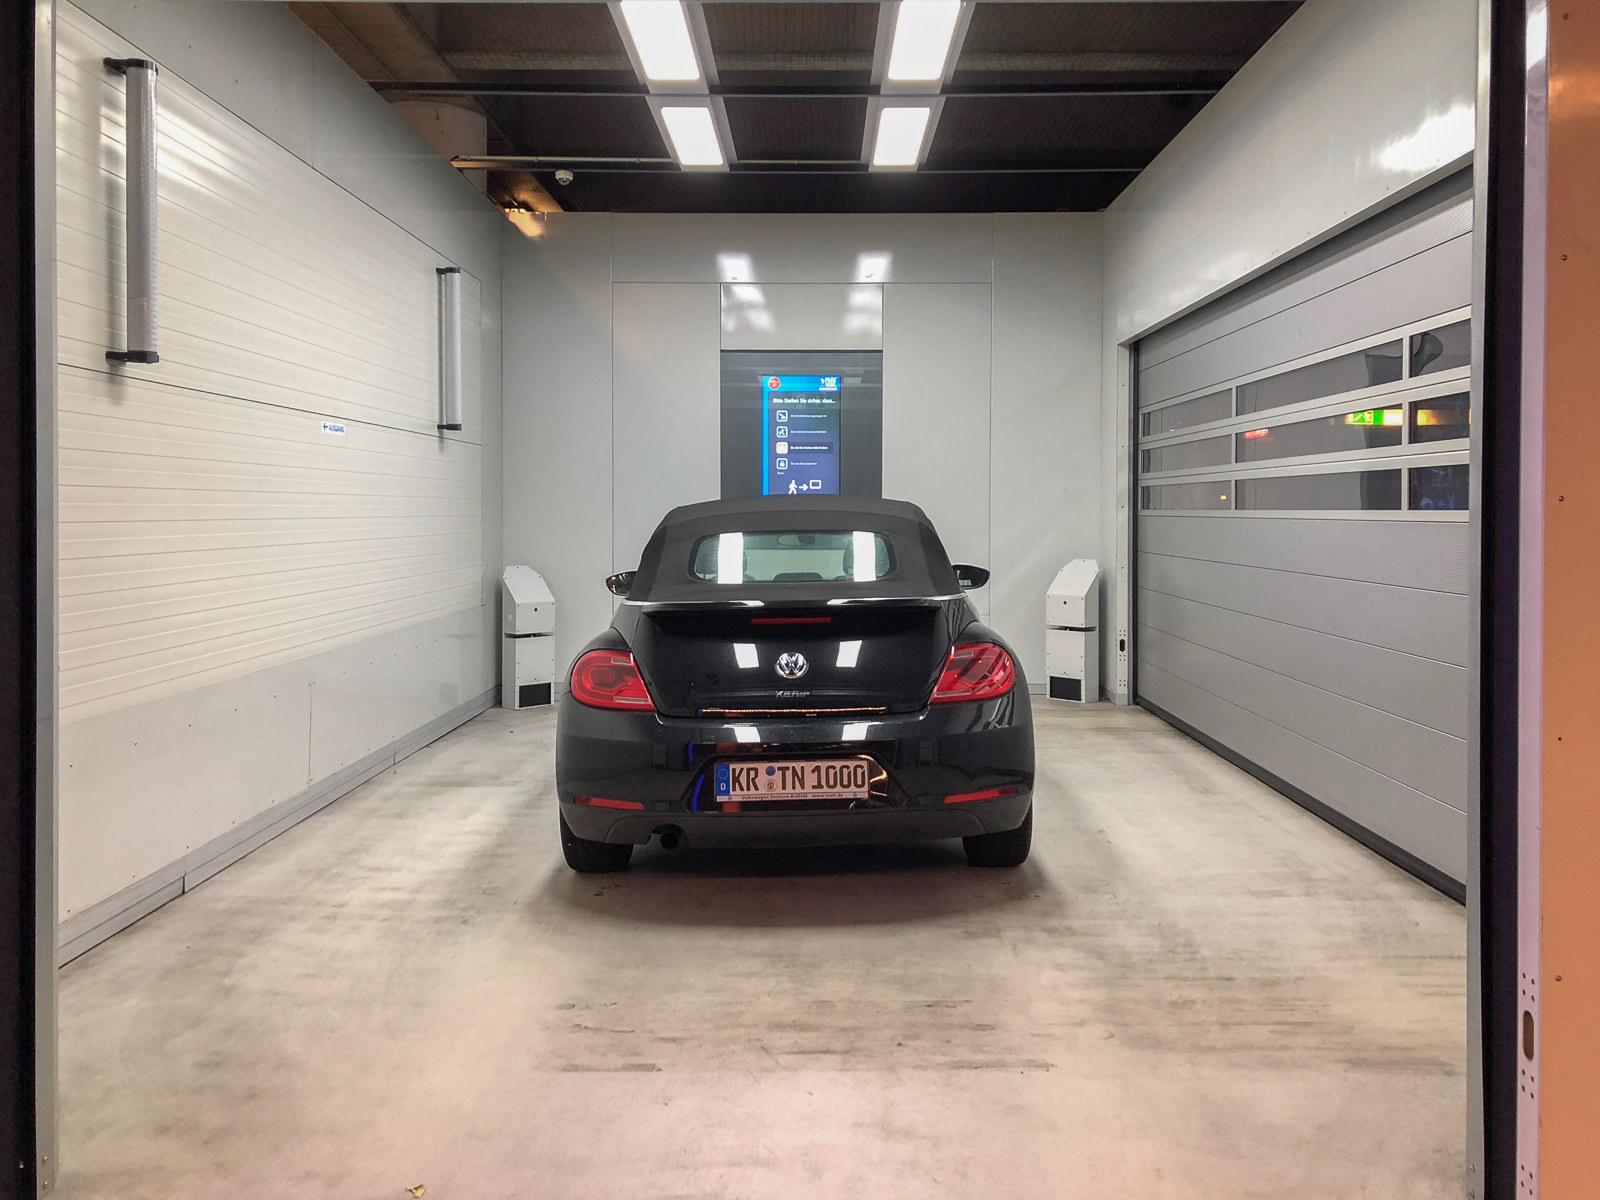 VIP Parken am Düsseldorfer Flughafen, VIP